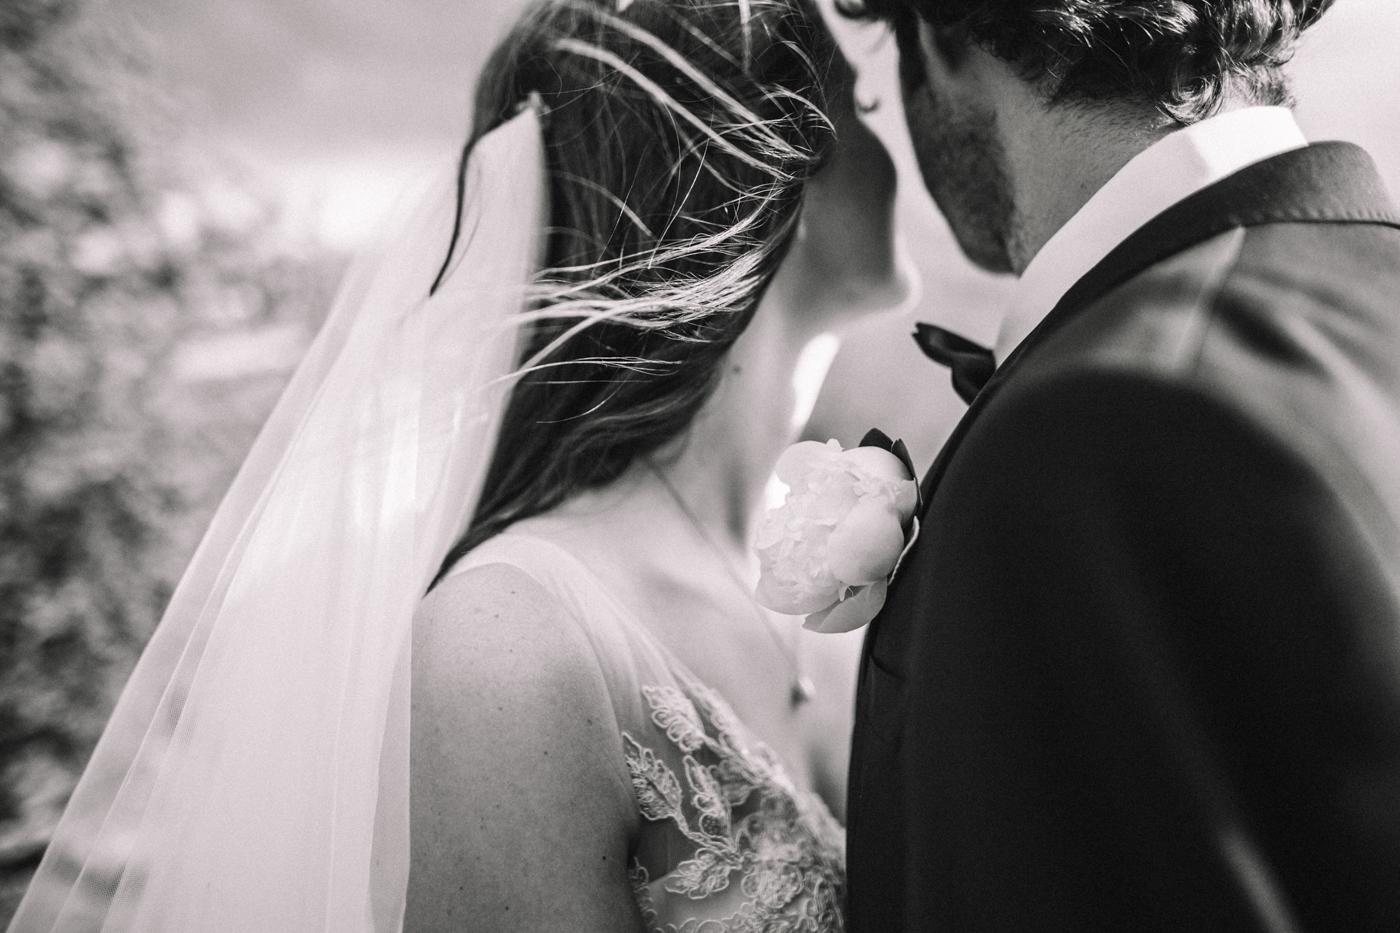 teesside-middlesbrough-north-east-wedding-photographer-creative-wedding-venues-0037.jpg